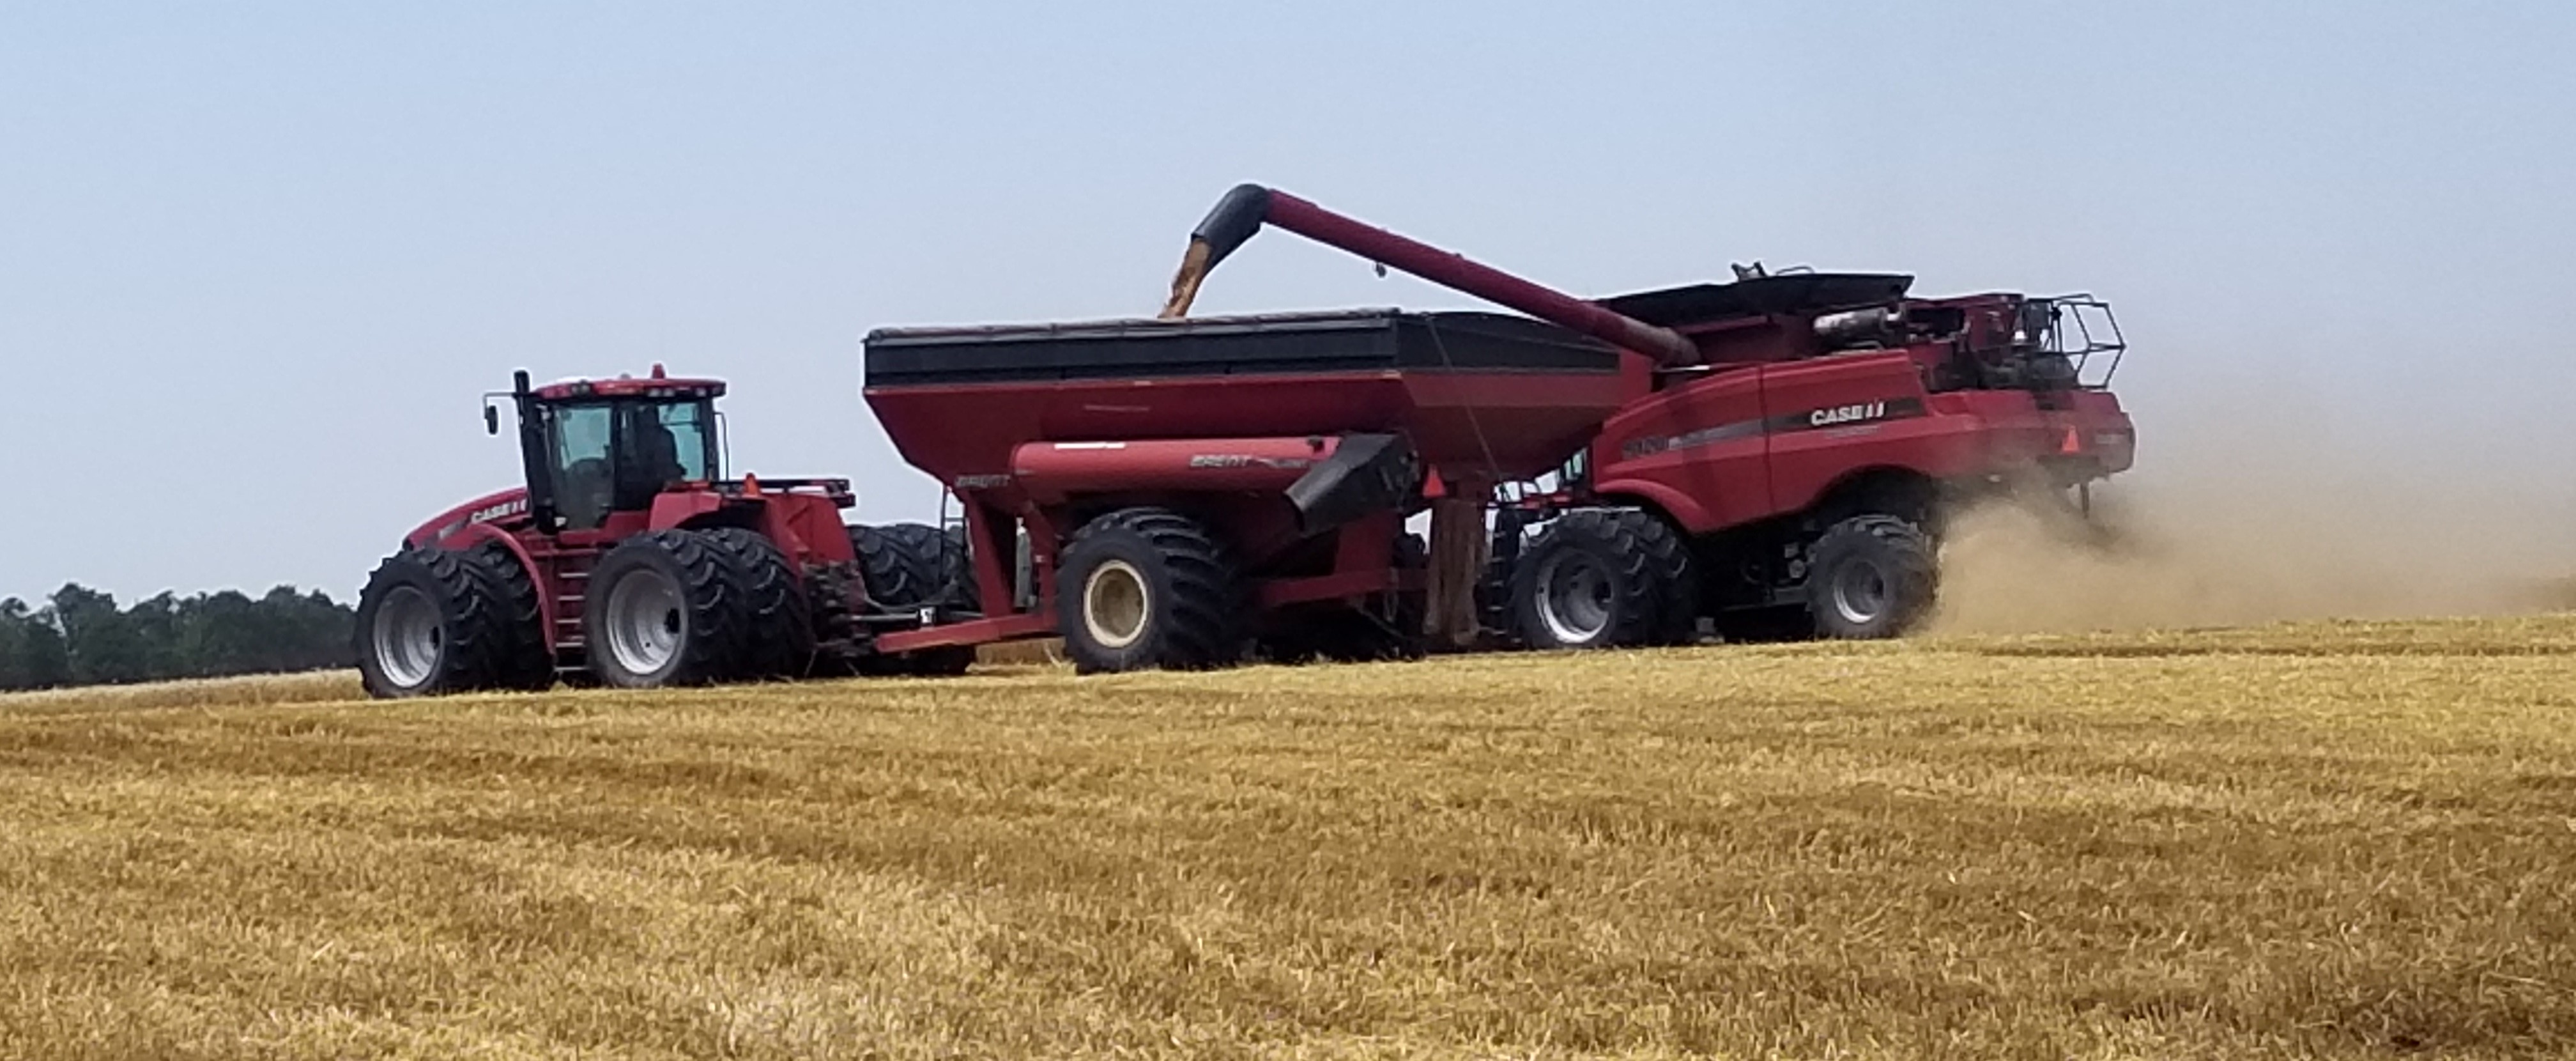 Allison Wheat Harvest Photo 2020 Landsca